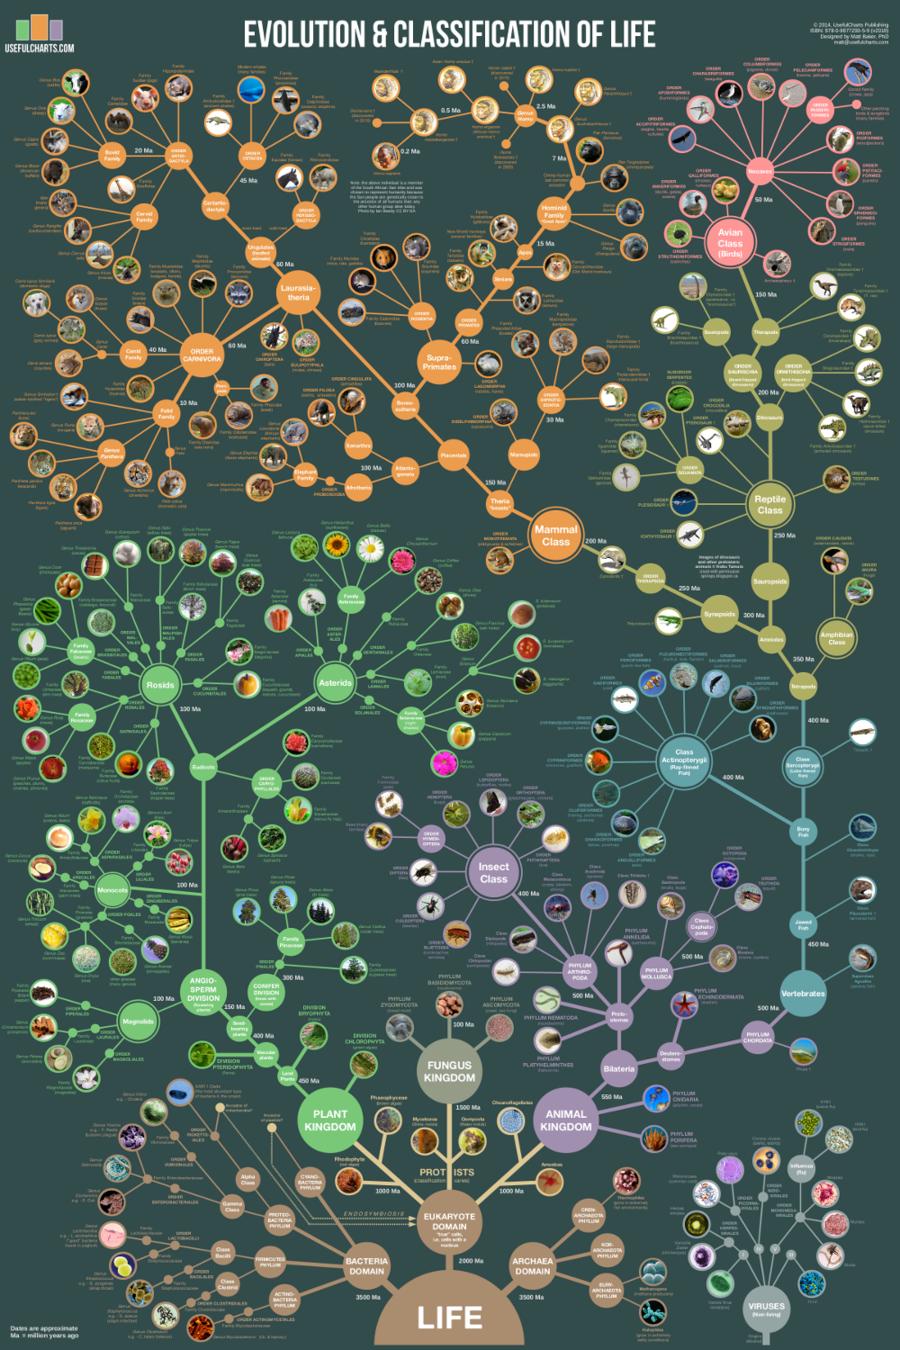 Evolution * Classification of Life